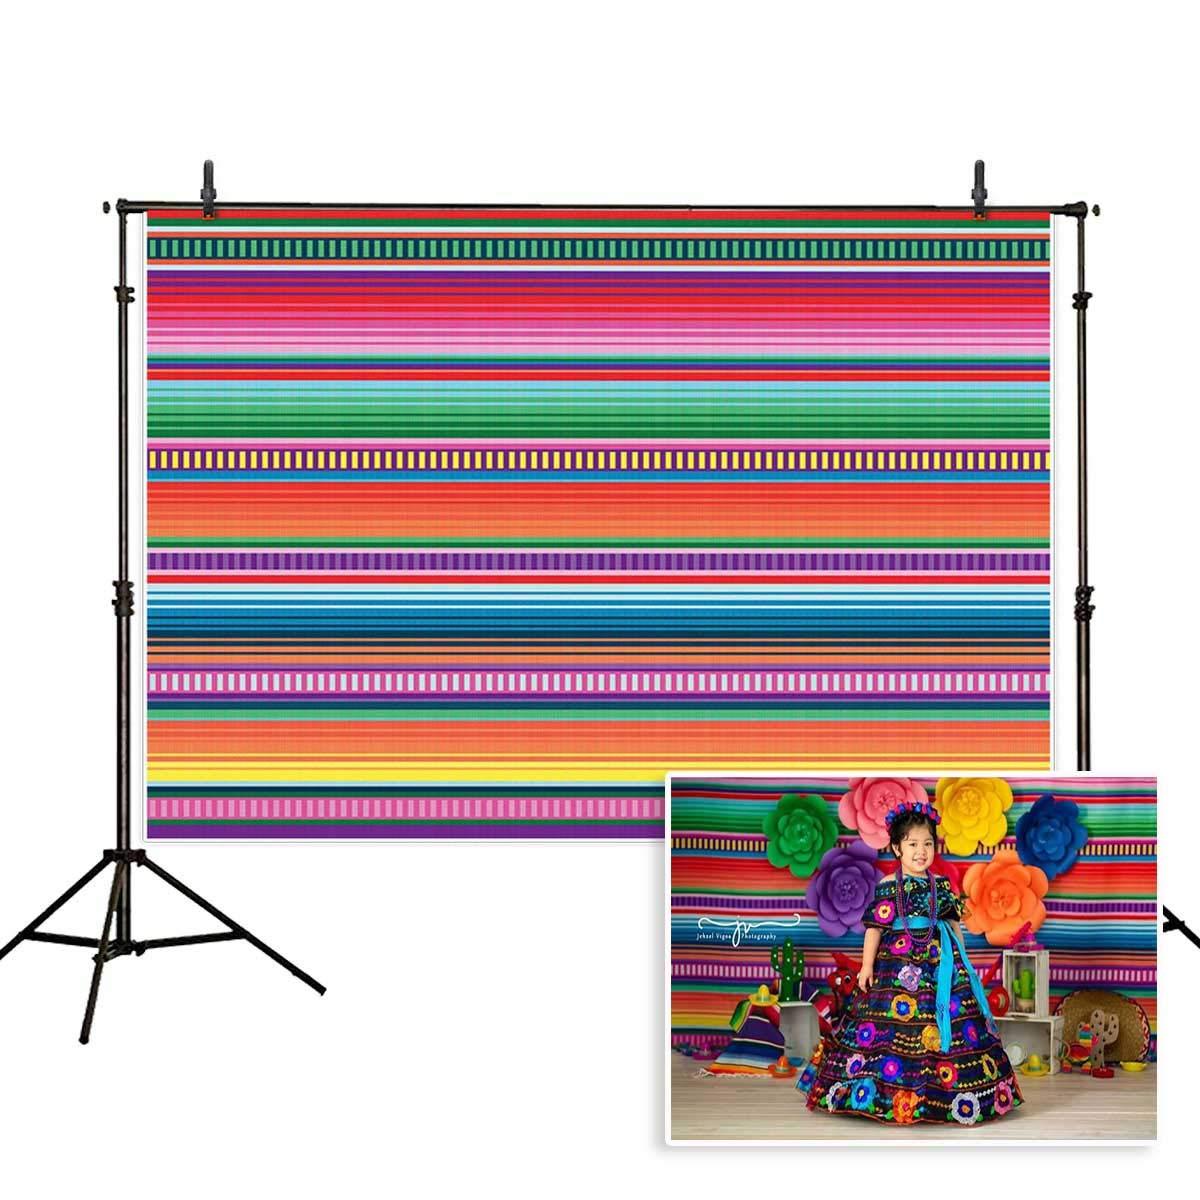 Allenjoy 8x6ft Color Fiesta Theme Party Stripes Backdrop Cinco De Mayo Mexican Festival Photography Background Cactus Banner Decoration Event Table Decor Banner Background Children Photo Booth Shoot